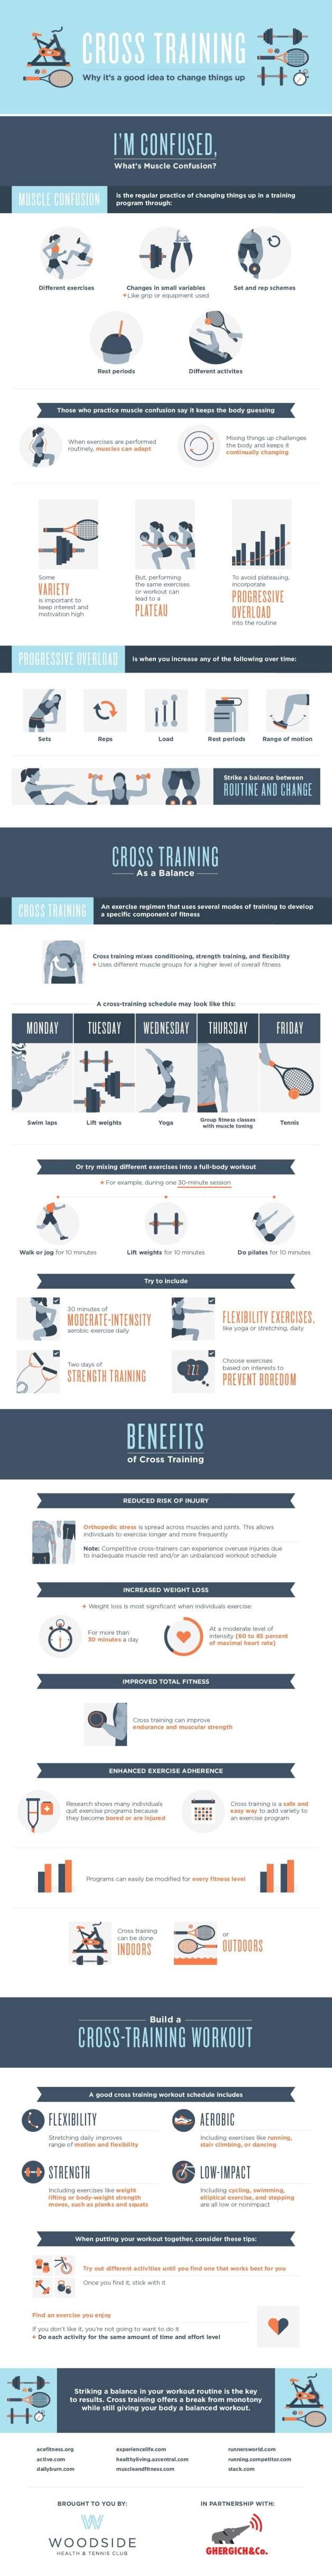 cross-training-infographic